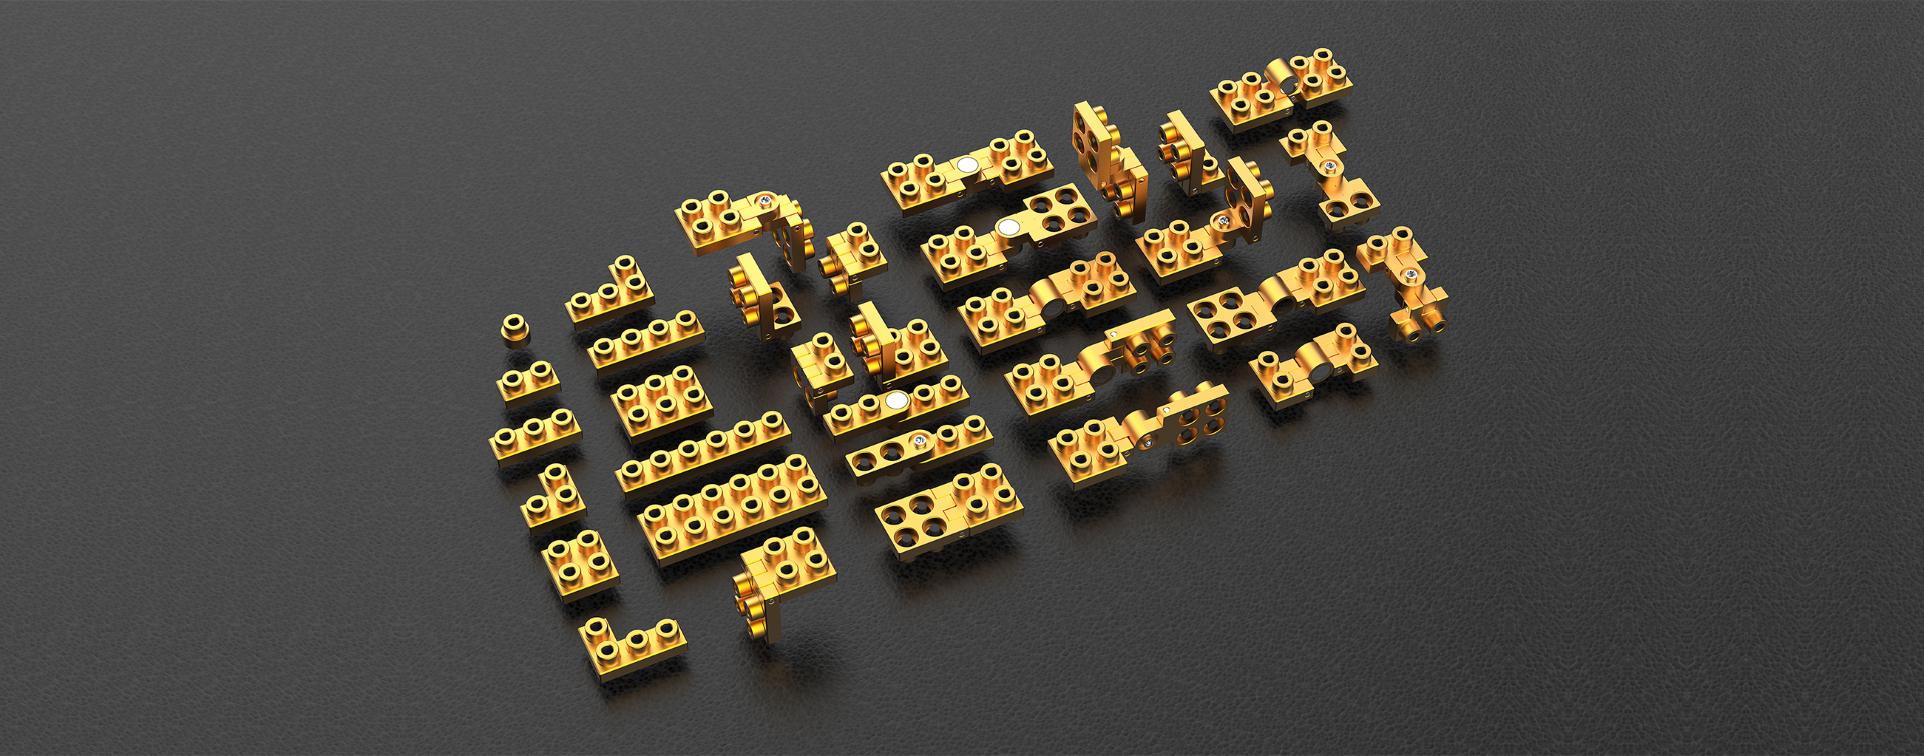 Aztec-Gold-Blocks-Render